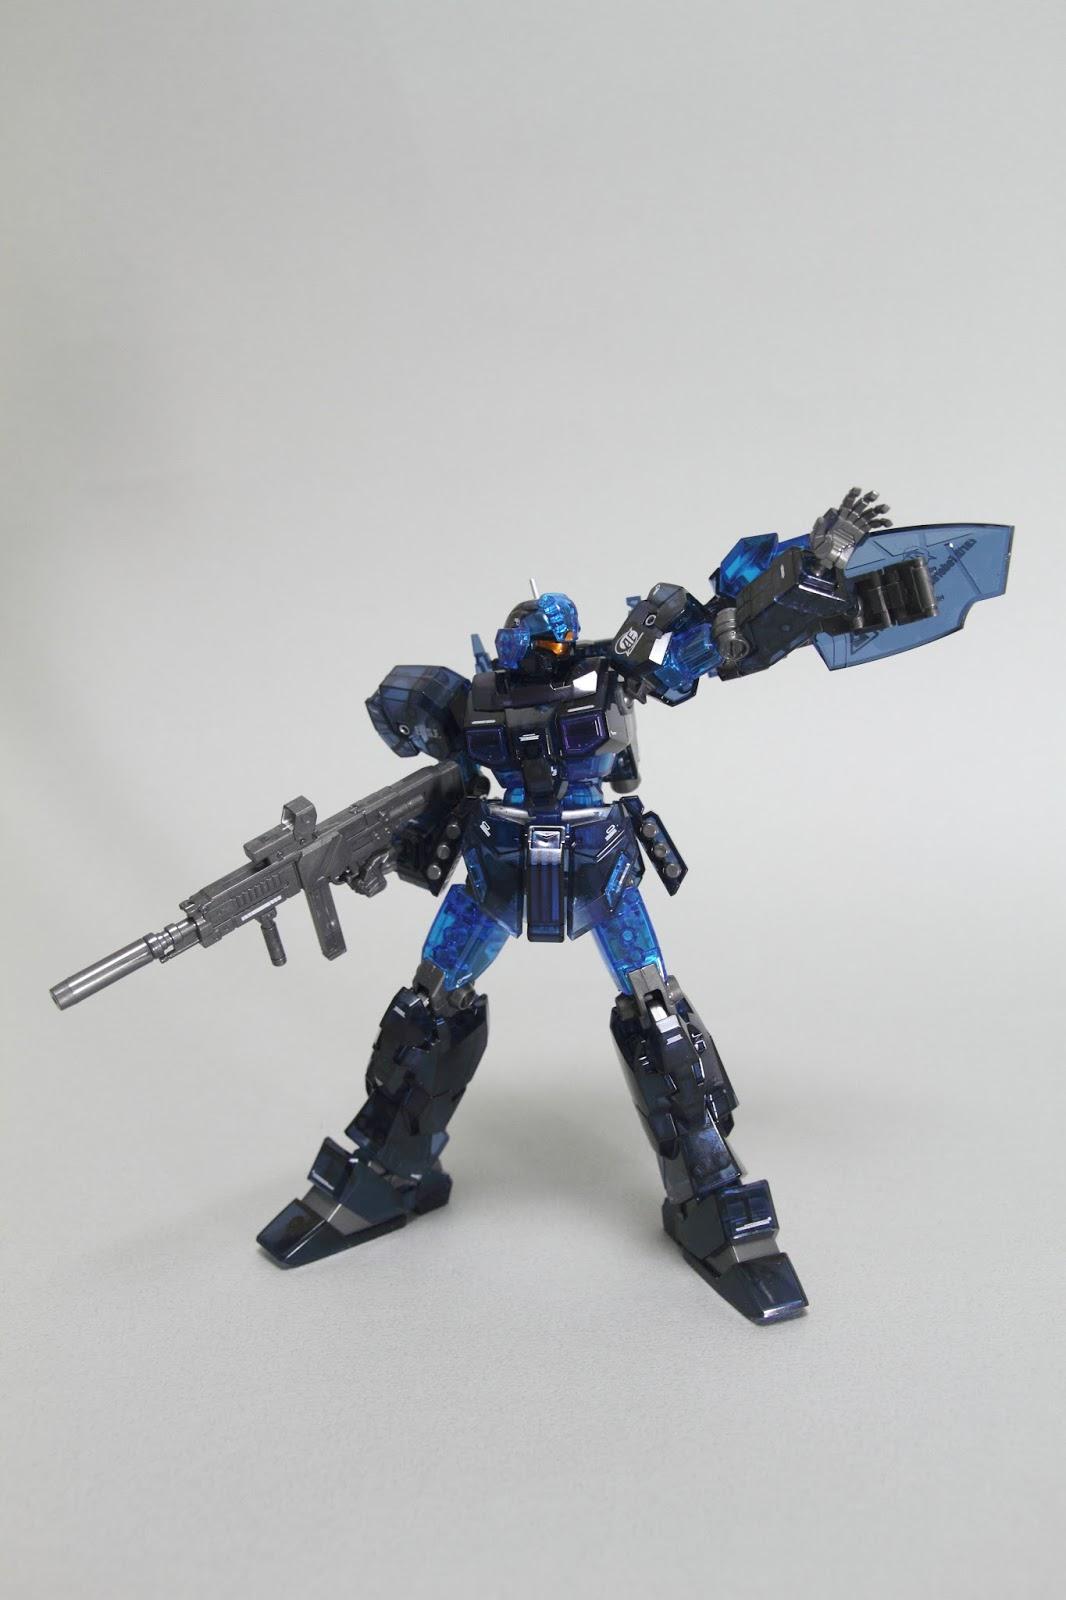 BANDAI GUNDAM HGUC 1//144 RGM-96X JESTA CANNON TRI-STAR CLEAR BLUE Version Model